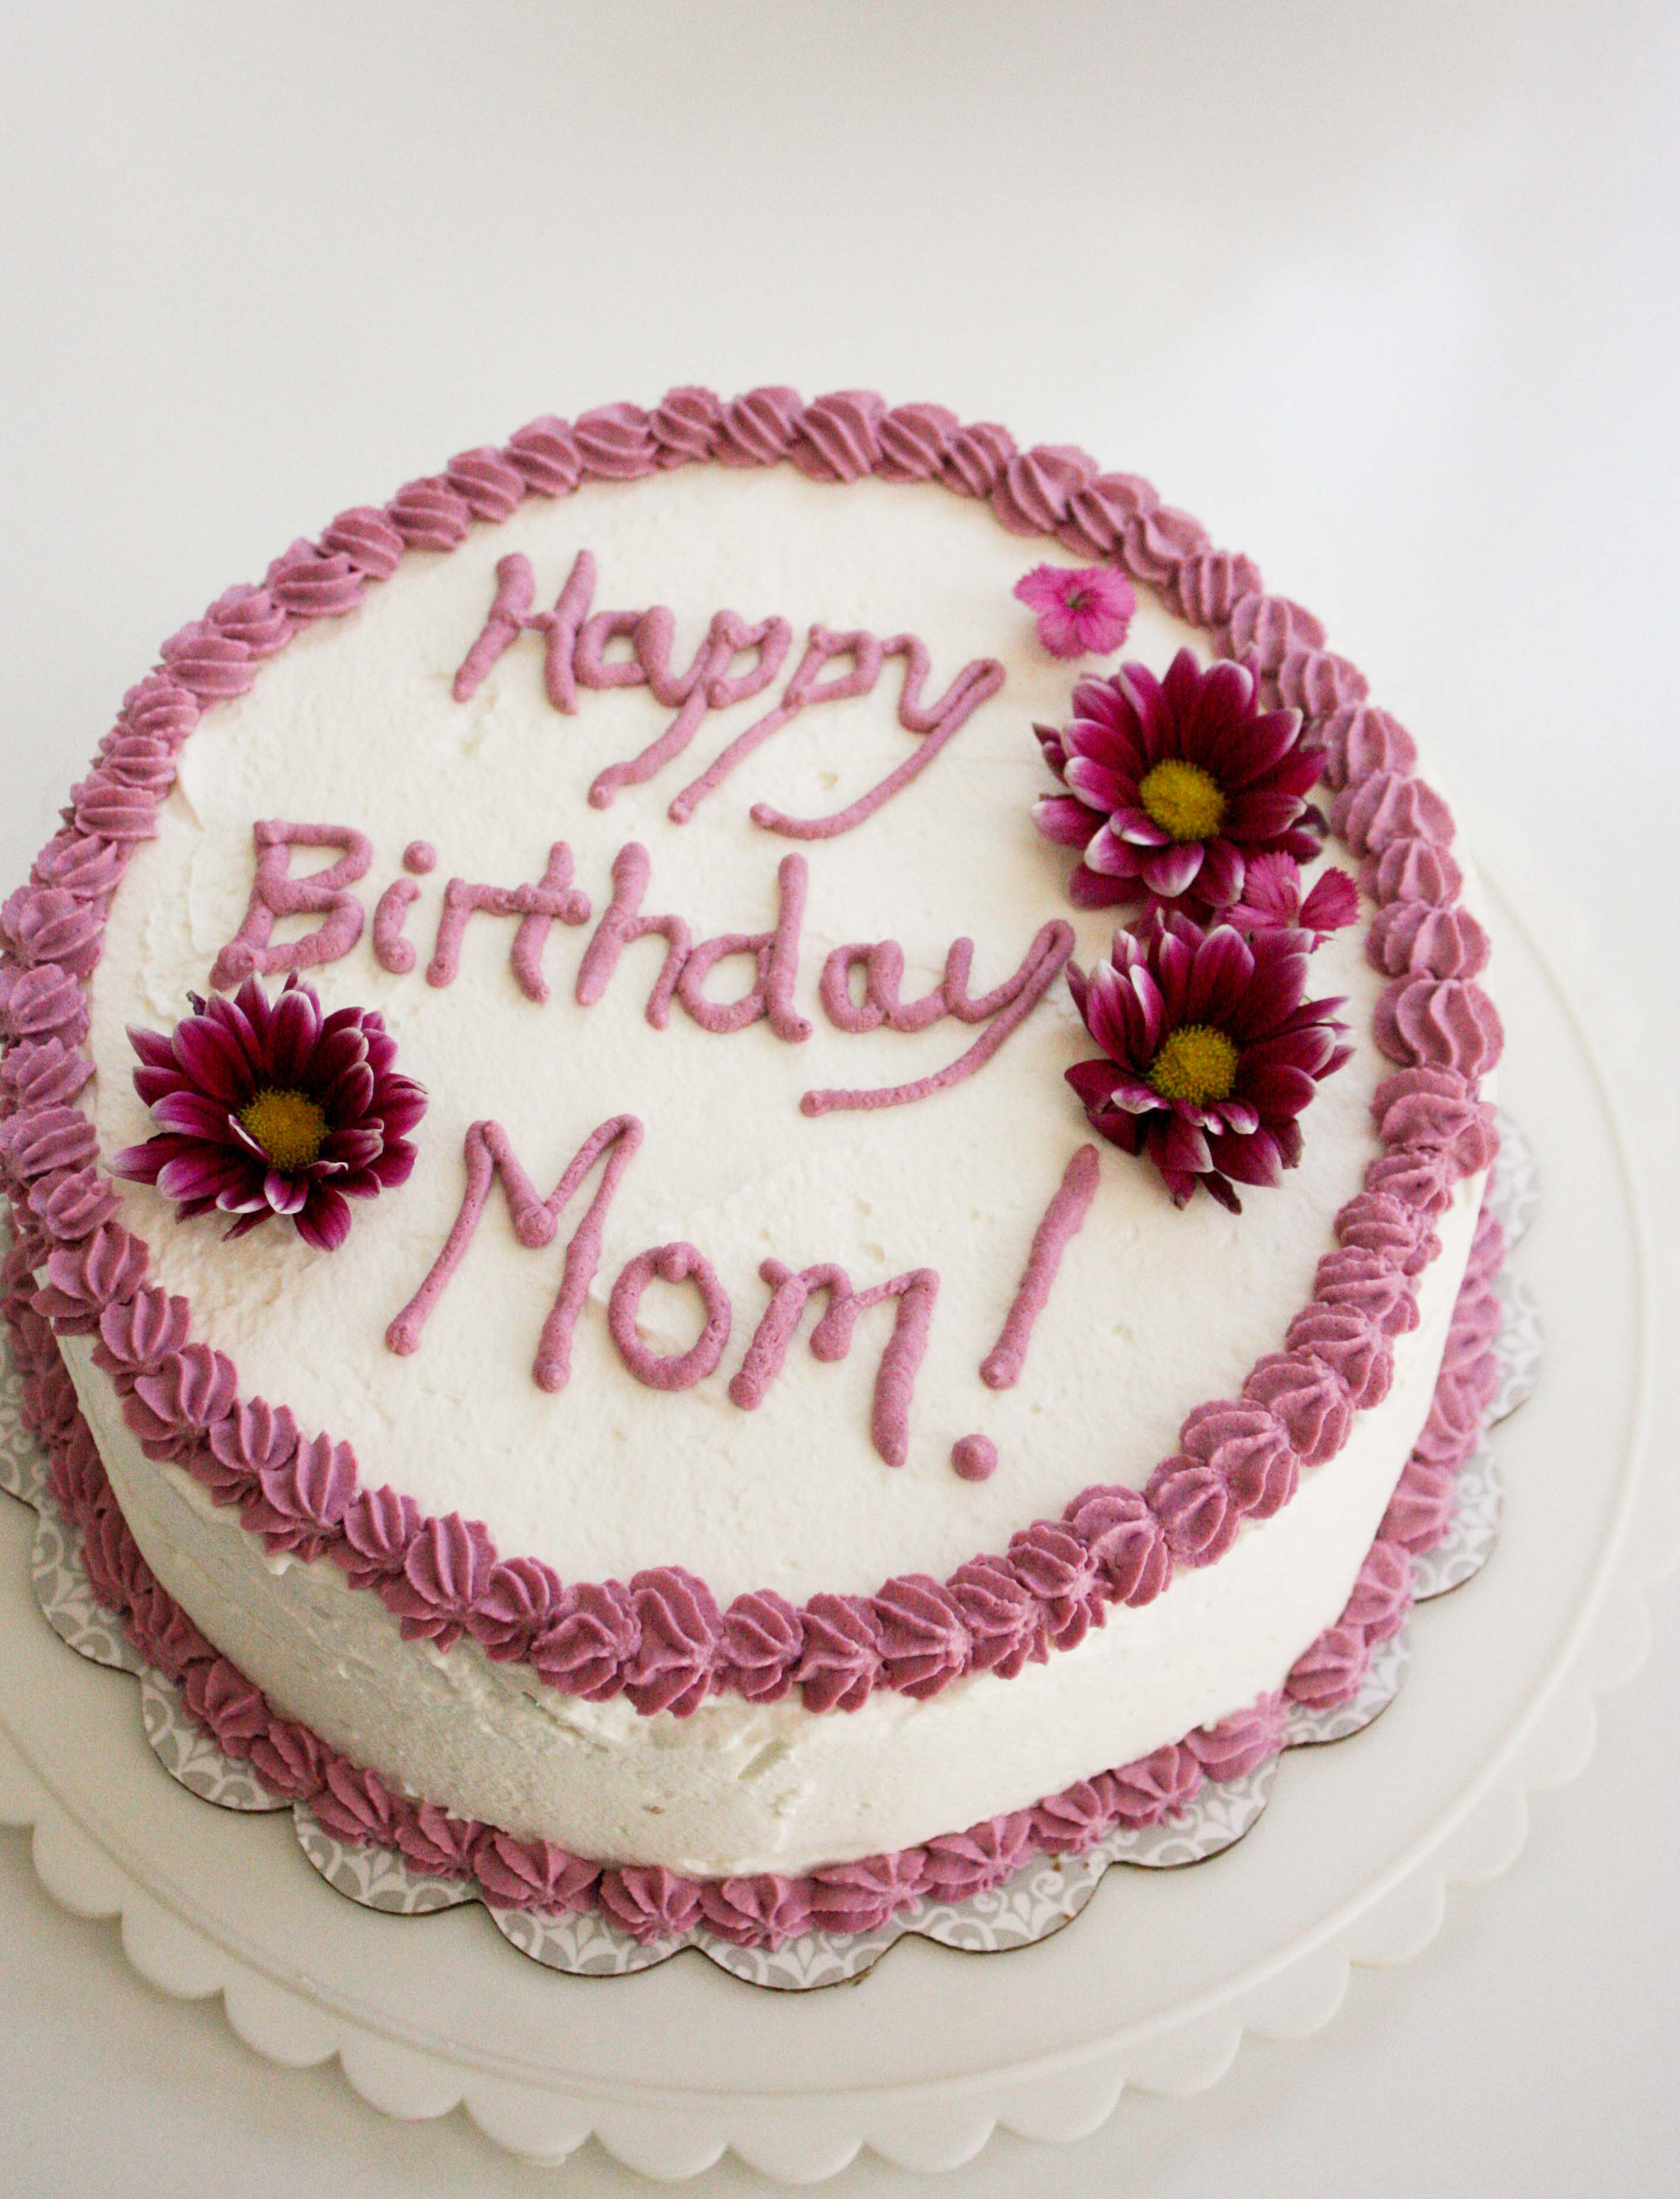 Birthday Cake For Mom  Banana Birthday Cake for My Mom – Foodologie